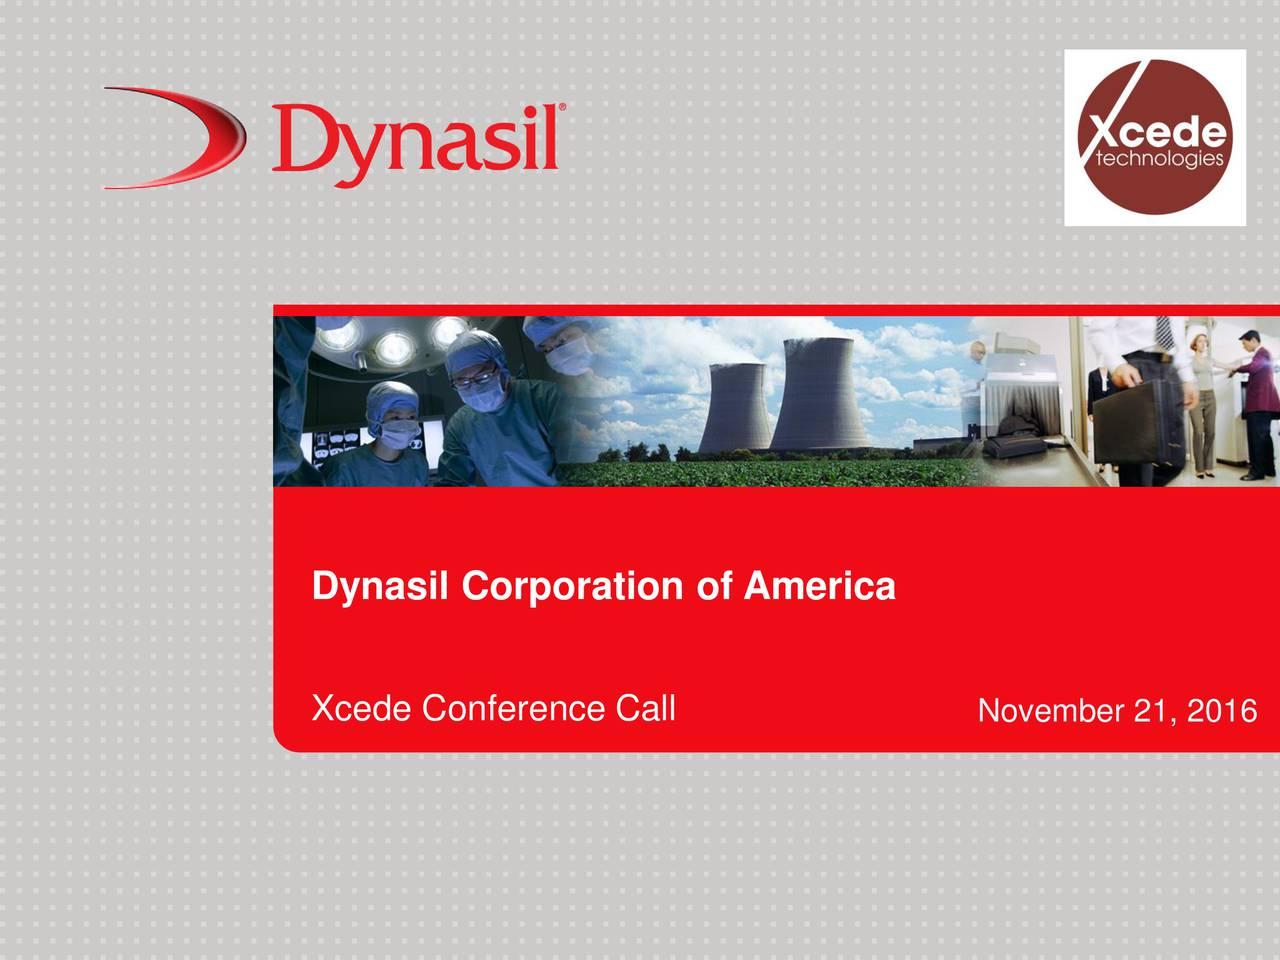 Xcede Conference Call November 21, 2016